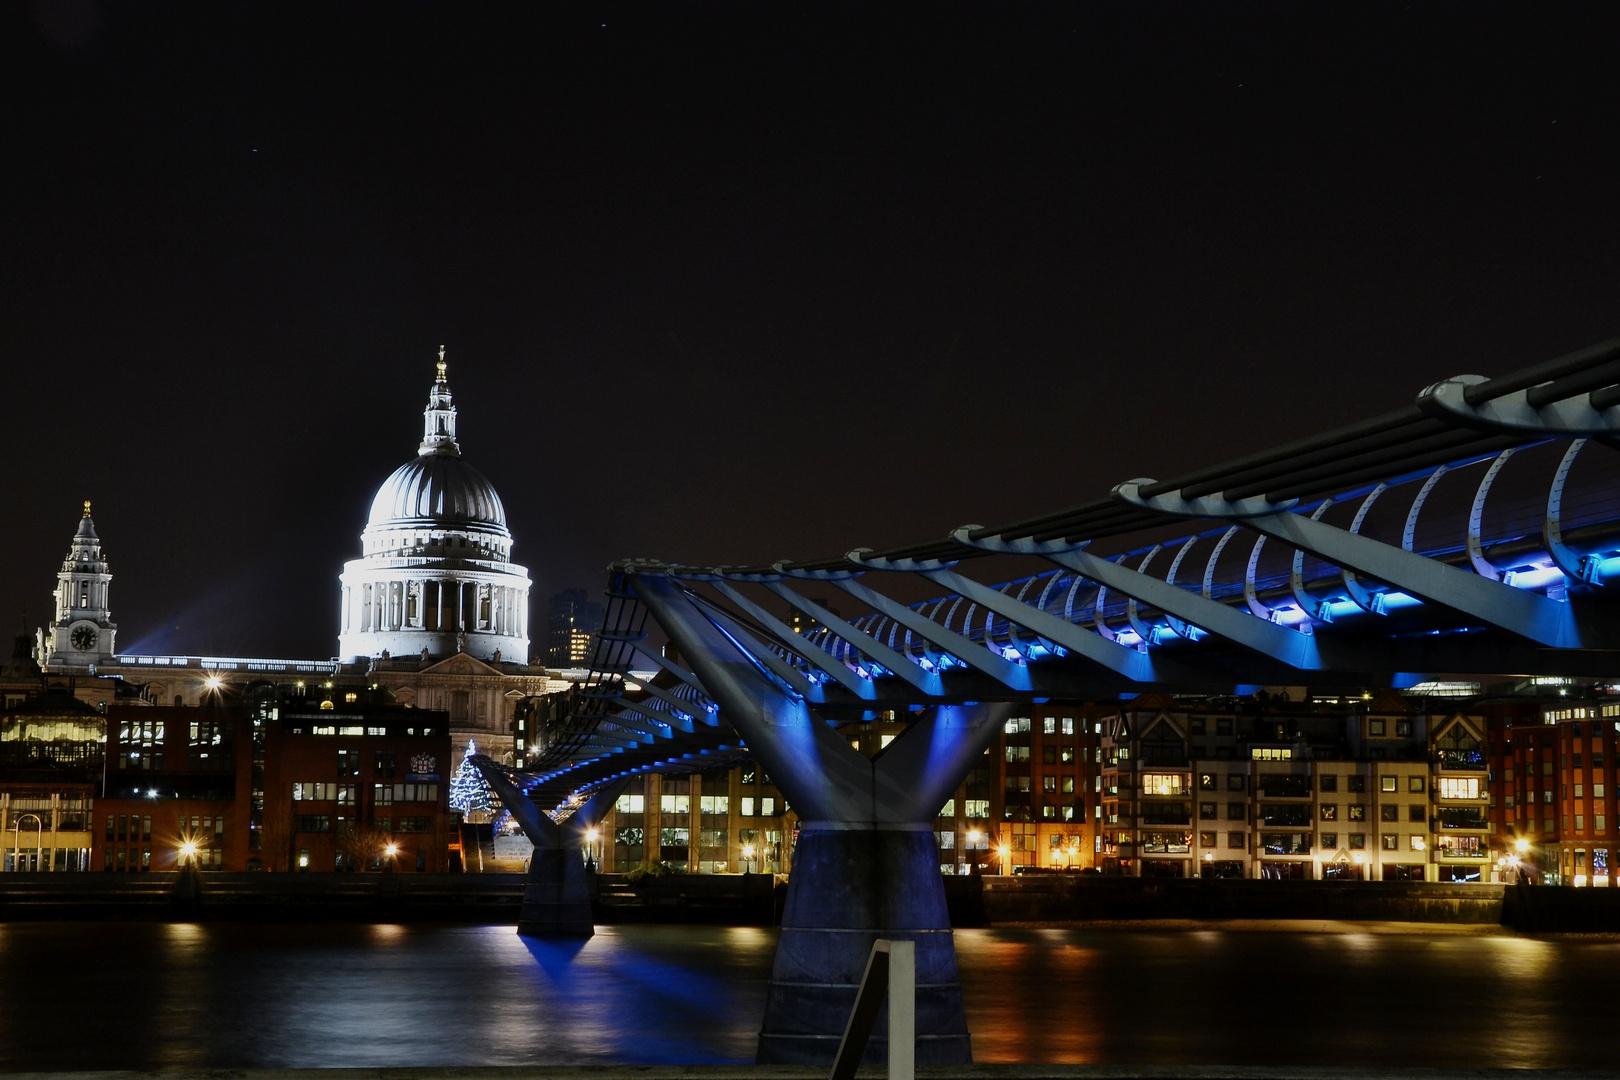 London by night 5